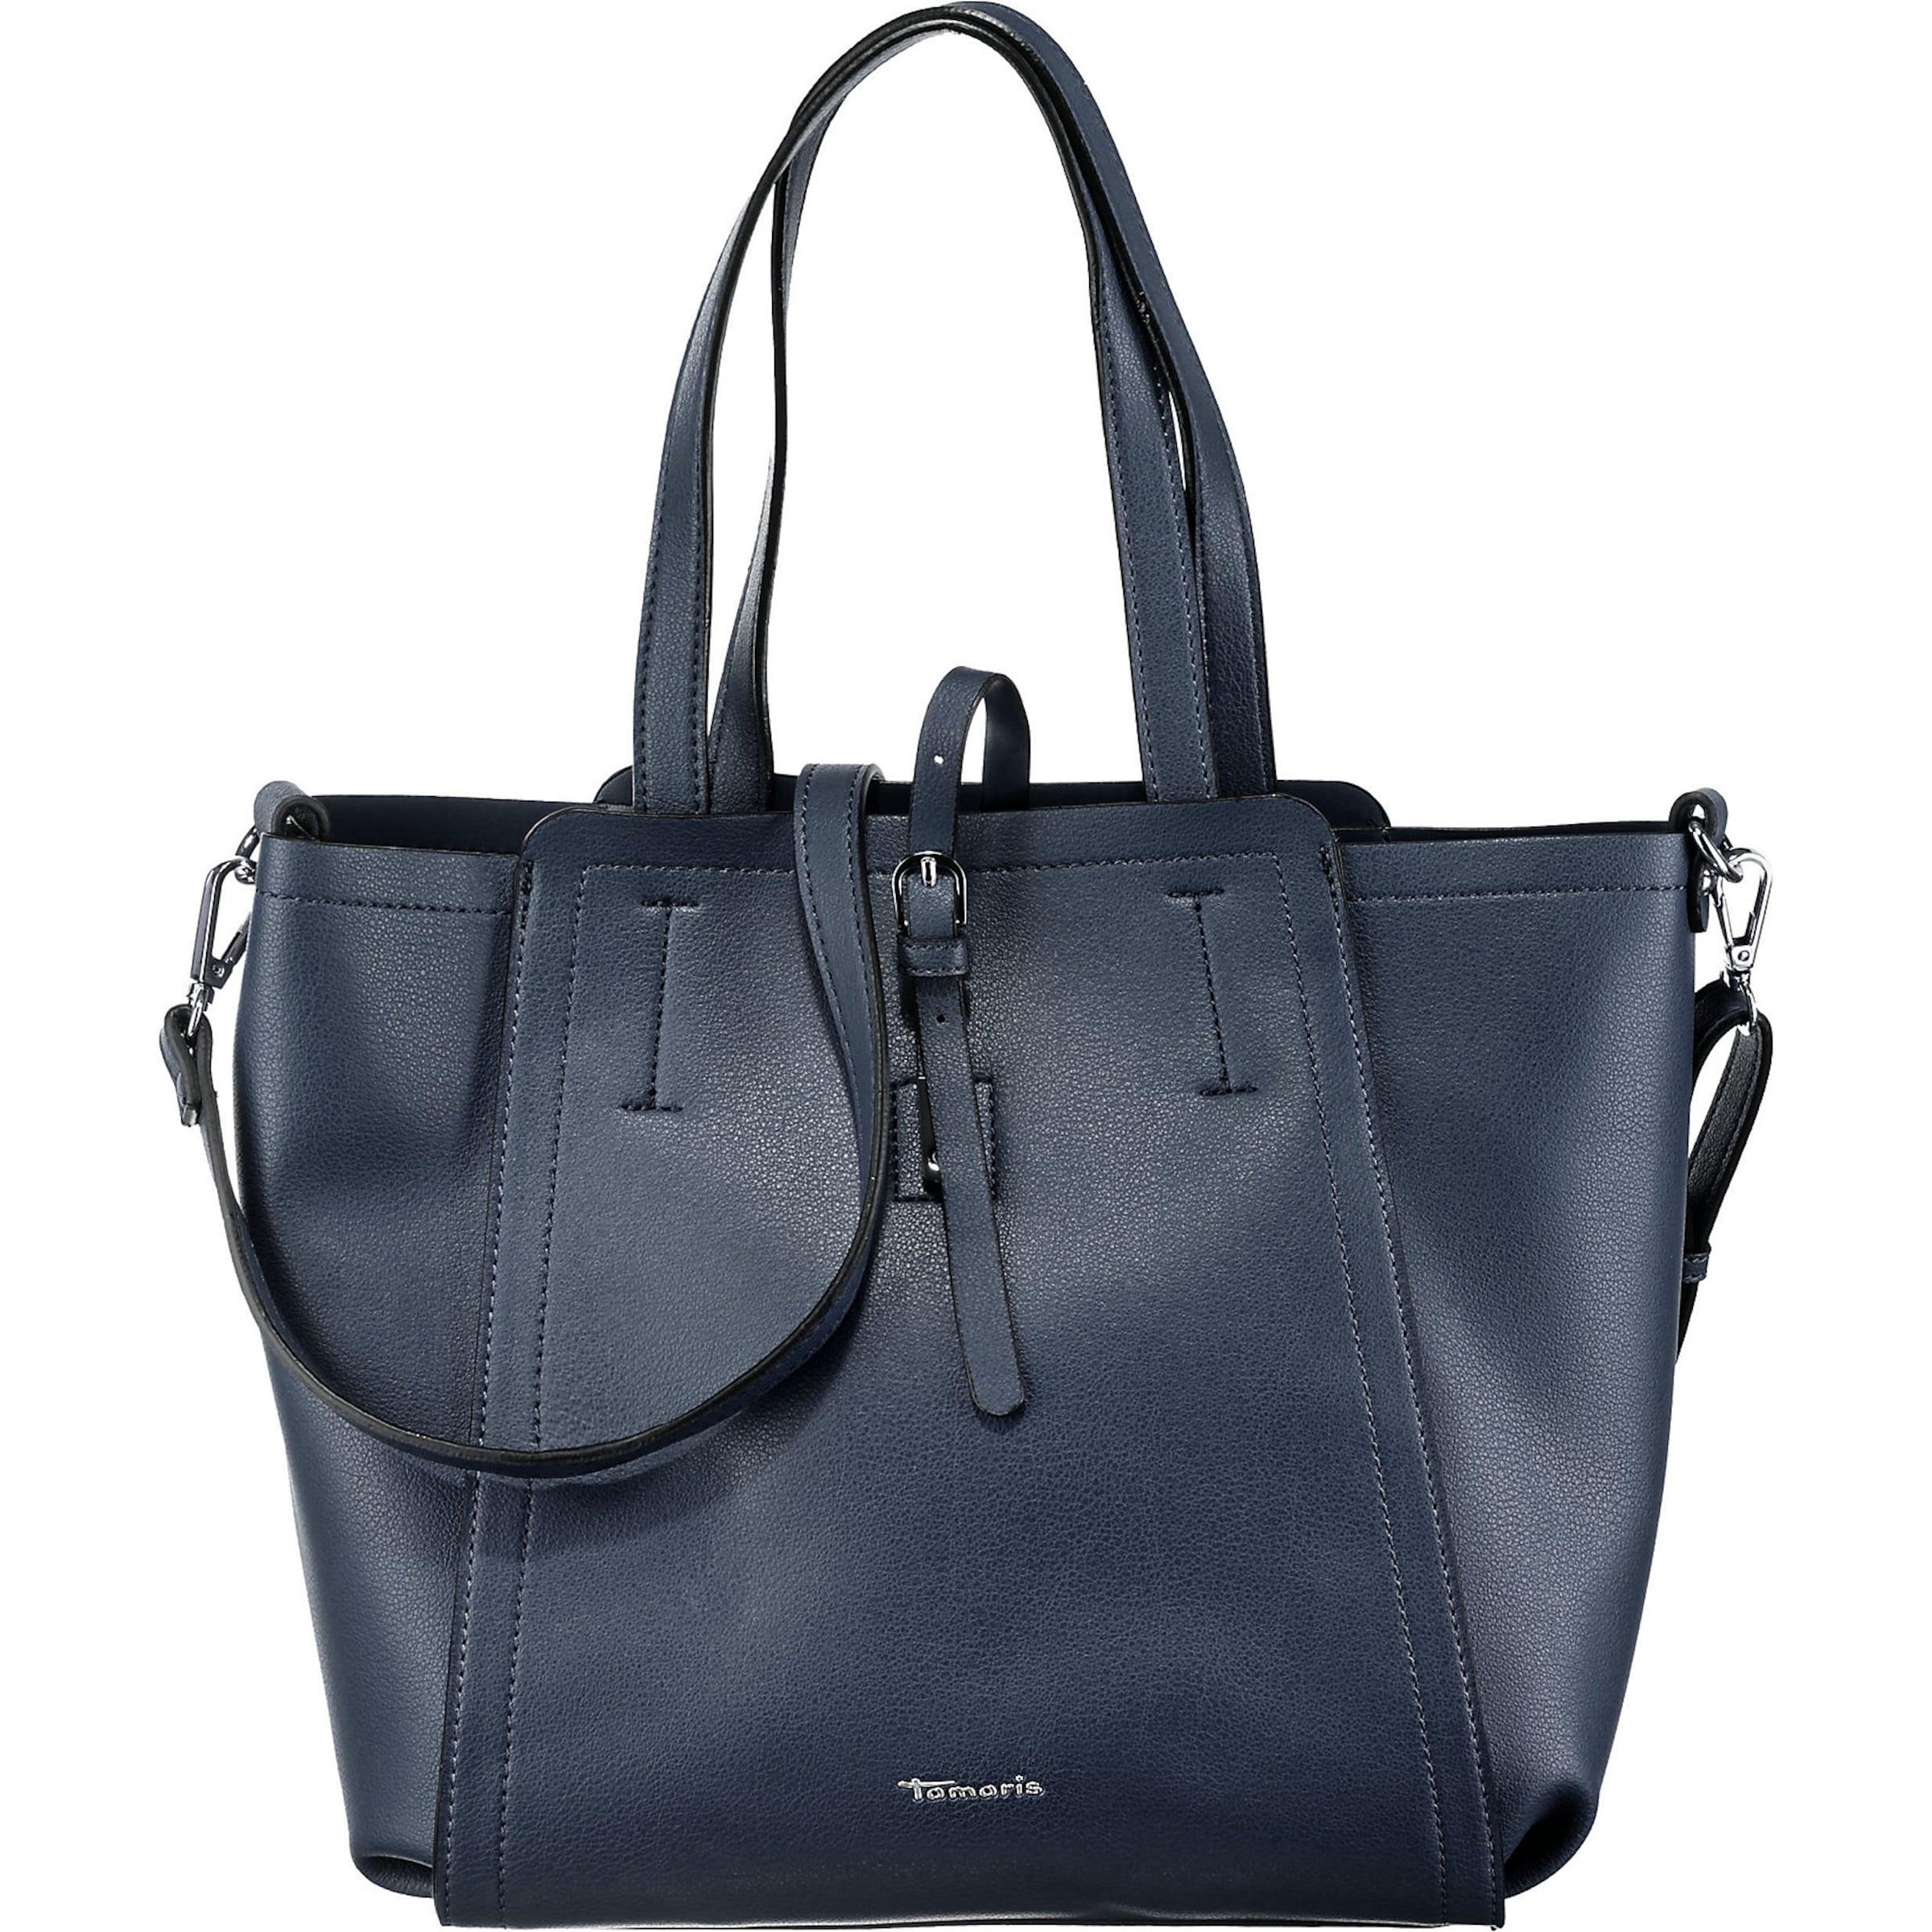 TAMARIS Shoppingväska 'Bruna' i marinblå